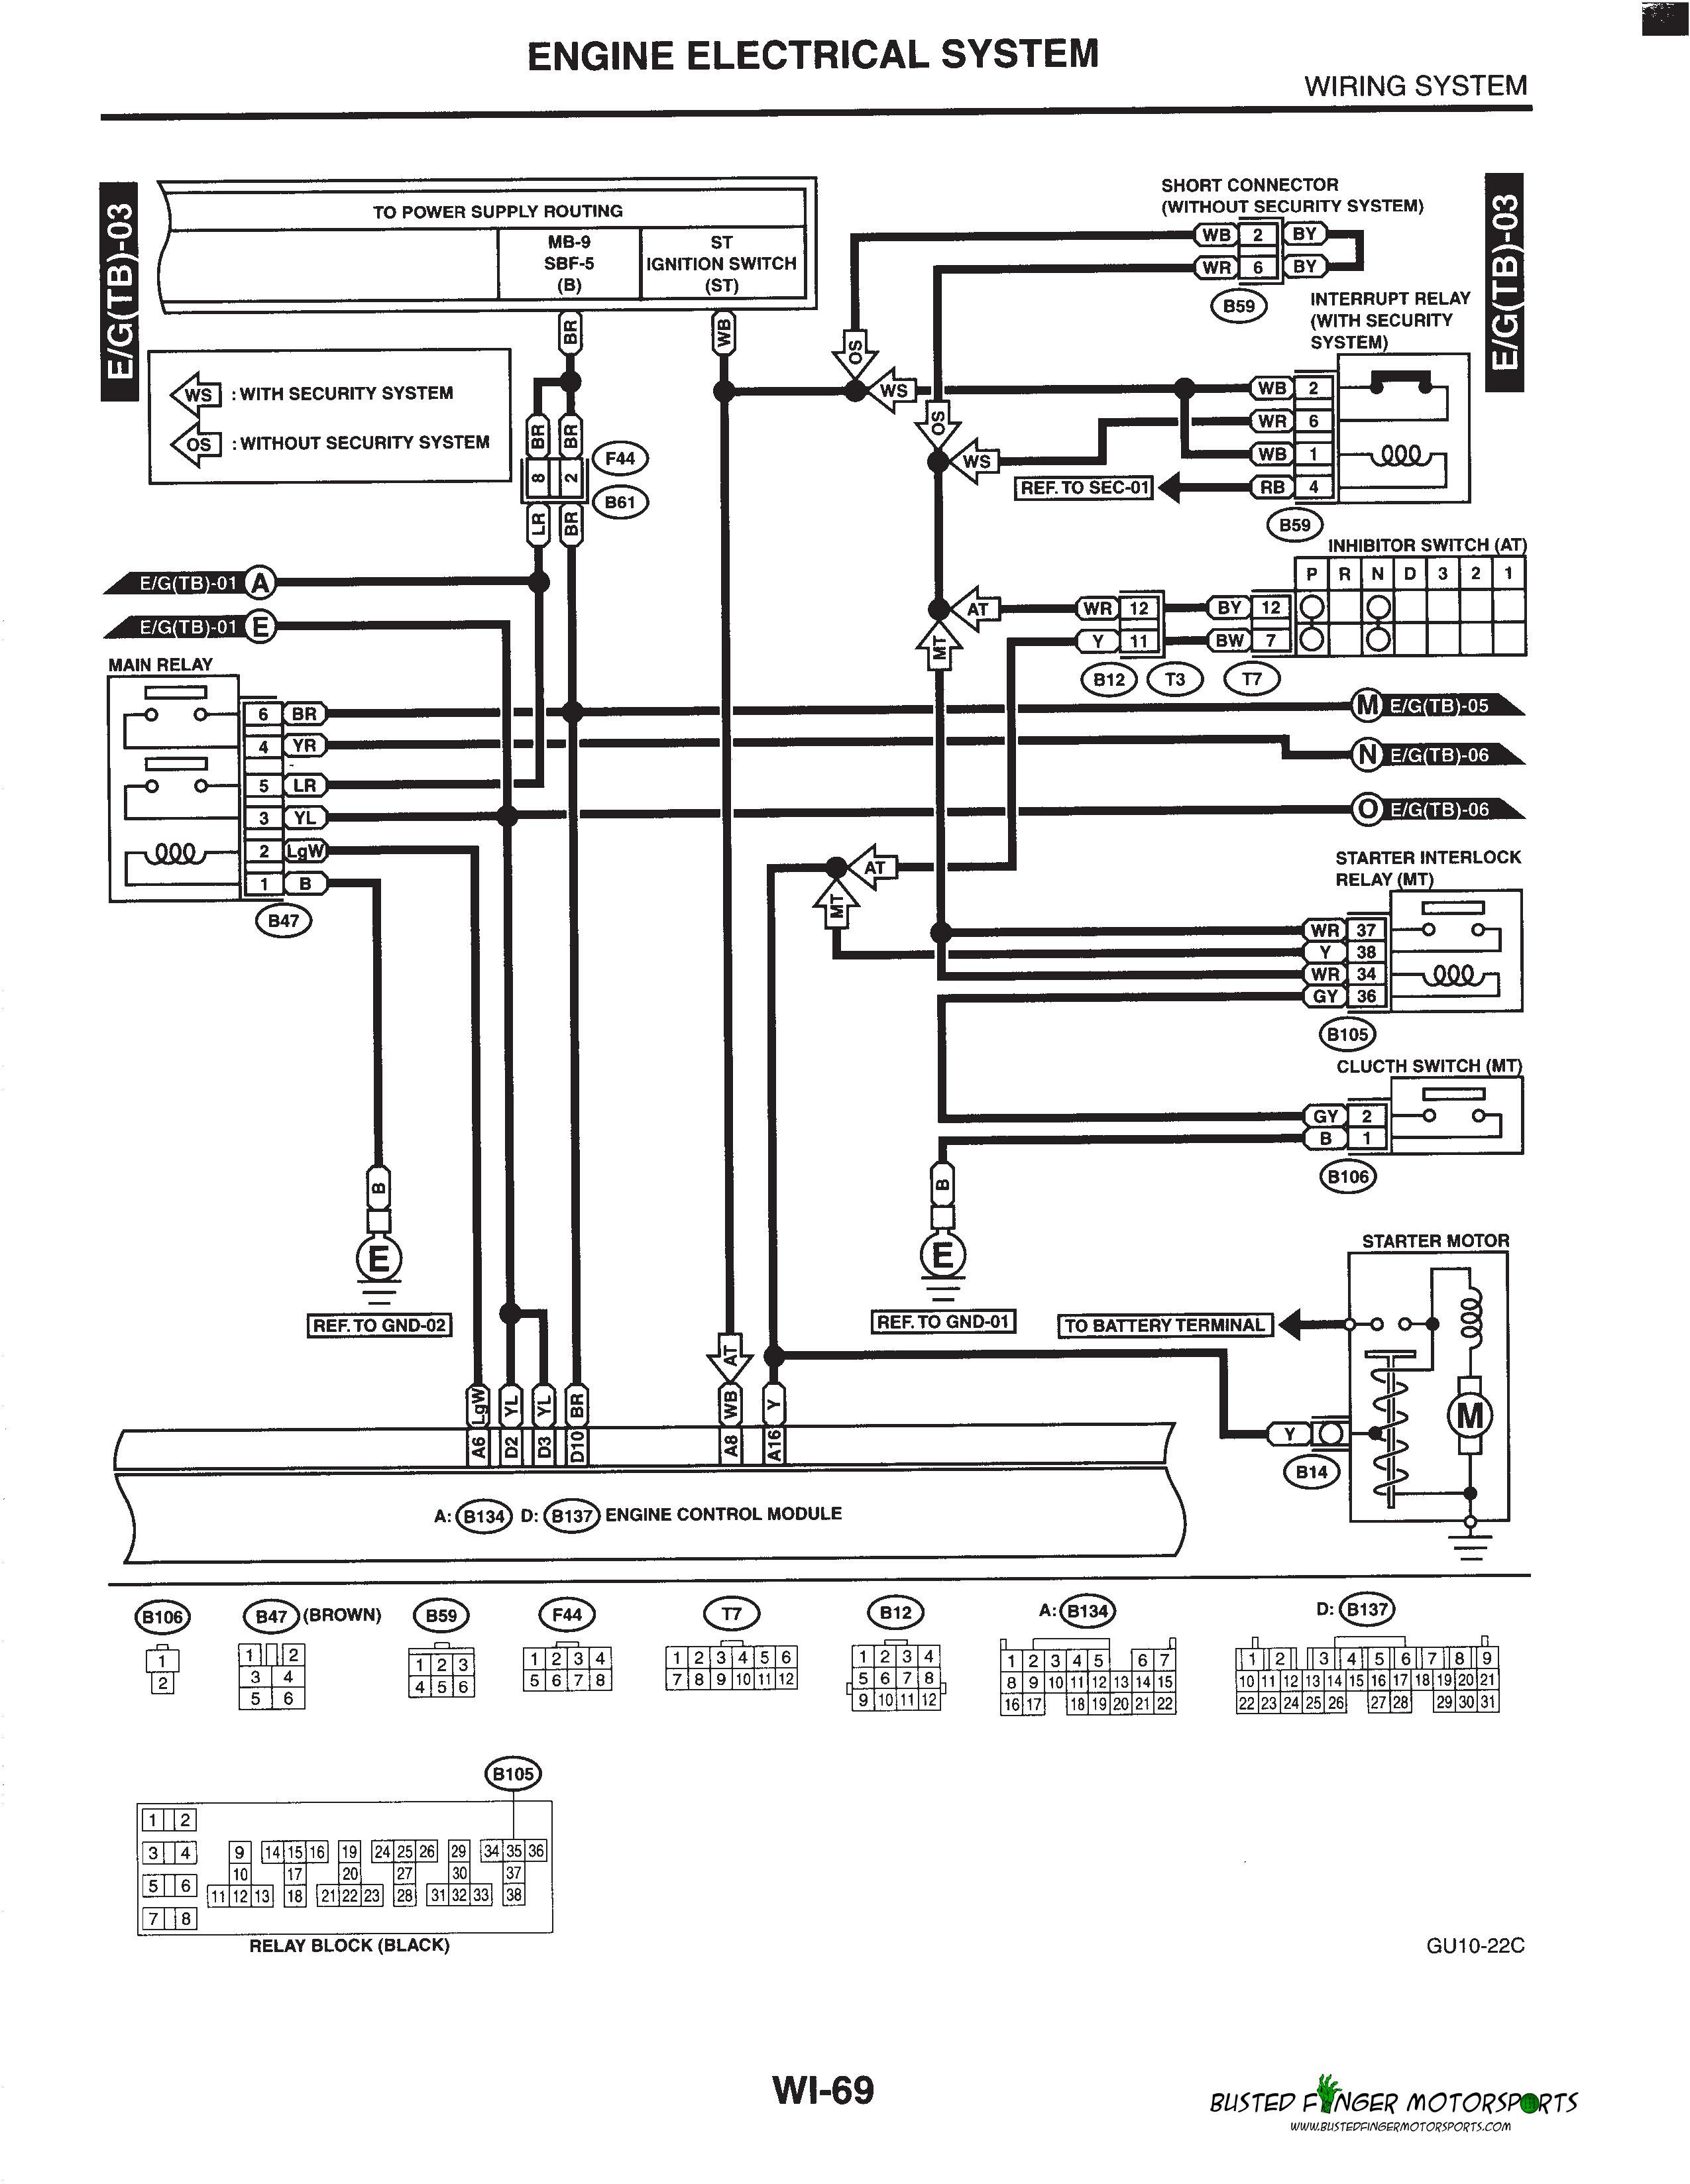 2005 chevy equinox headlight wiring diagram ford focus zx4 radio 2006 subaru b9 tribeca engine chevrolet